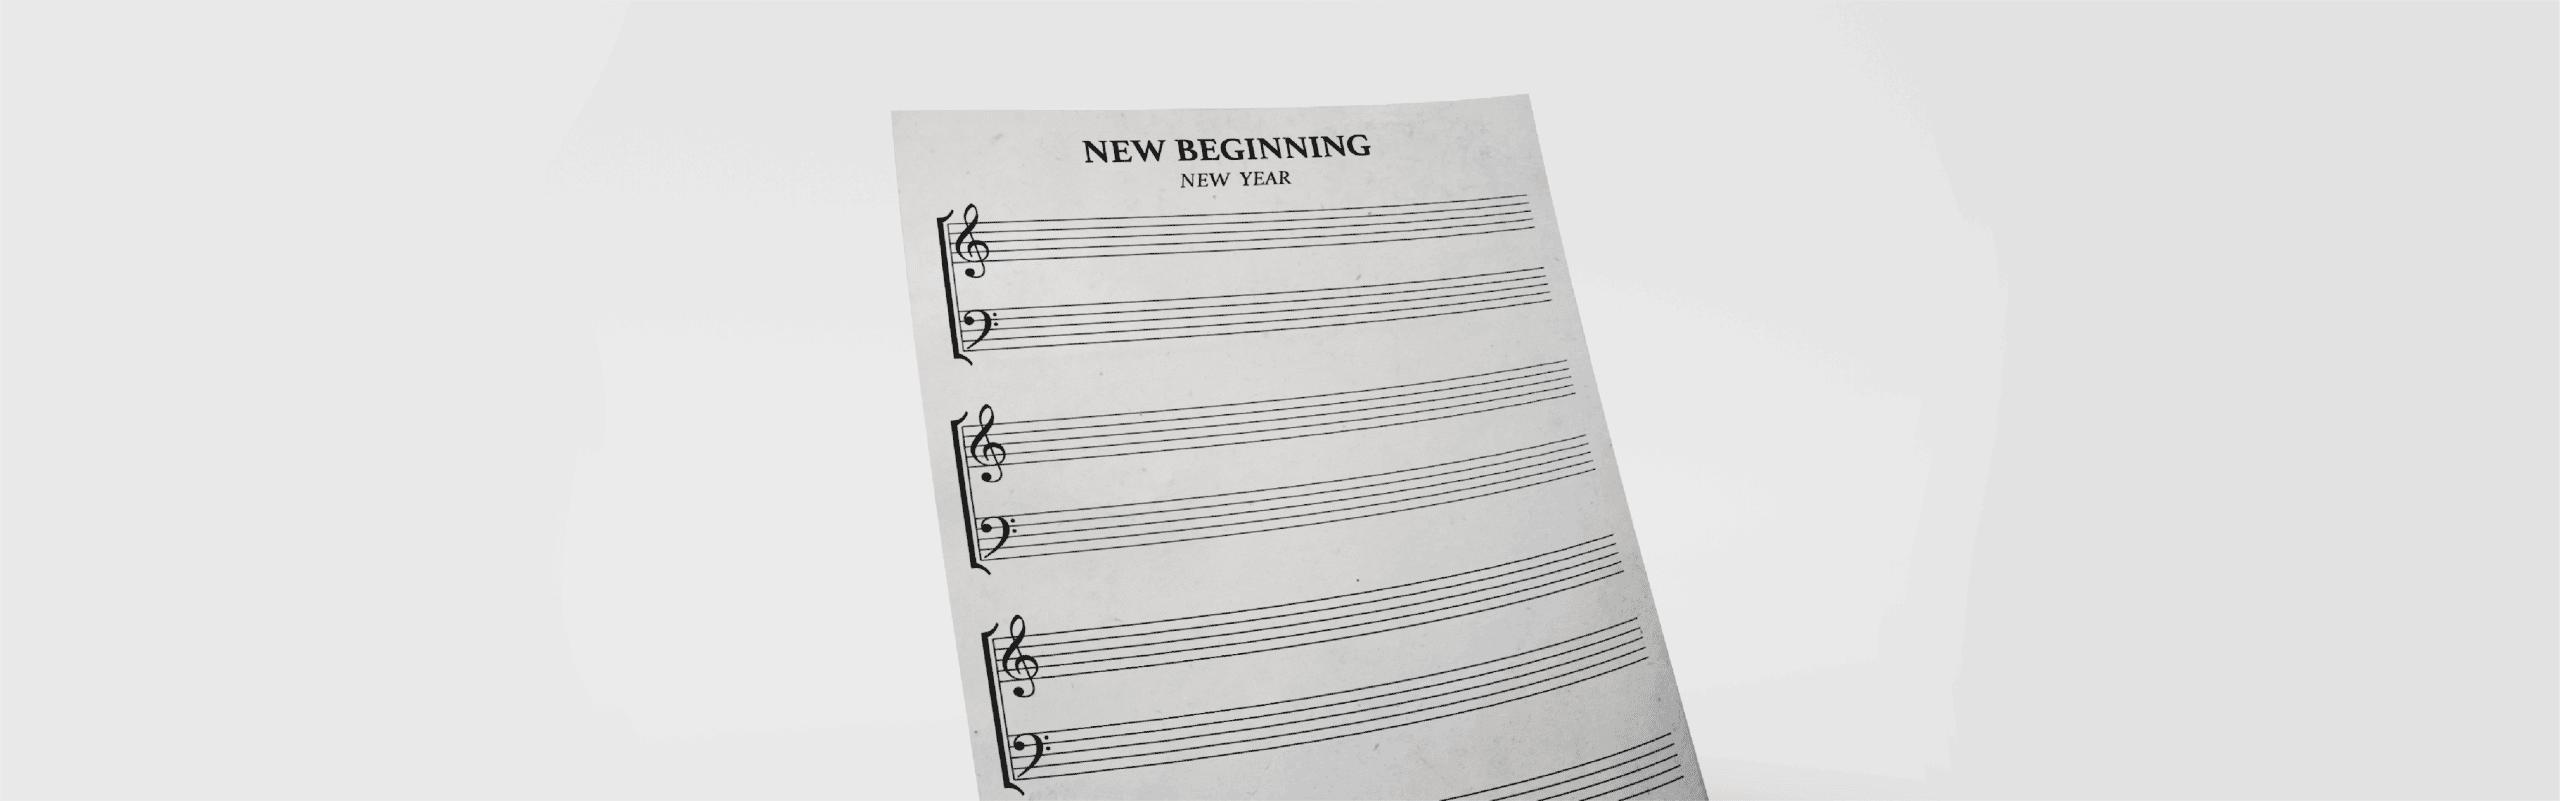 Empty music sheet